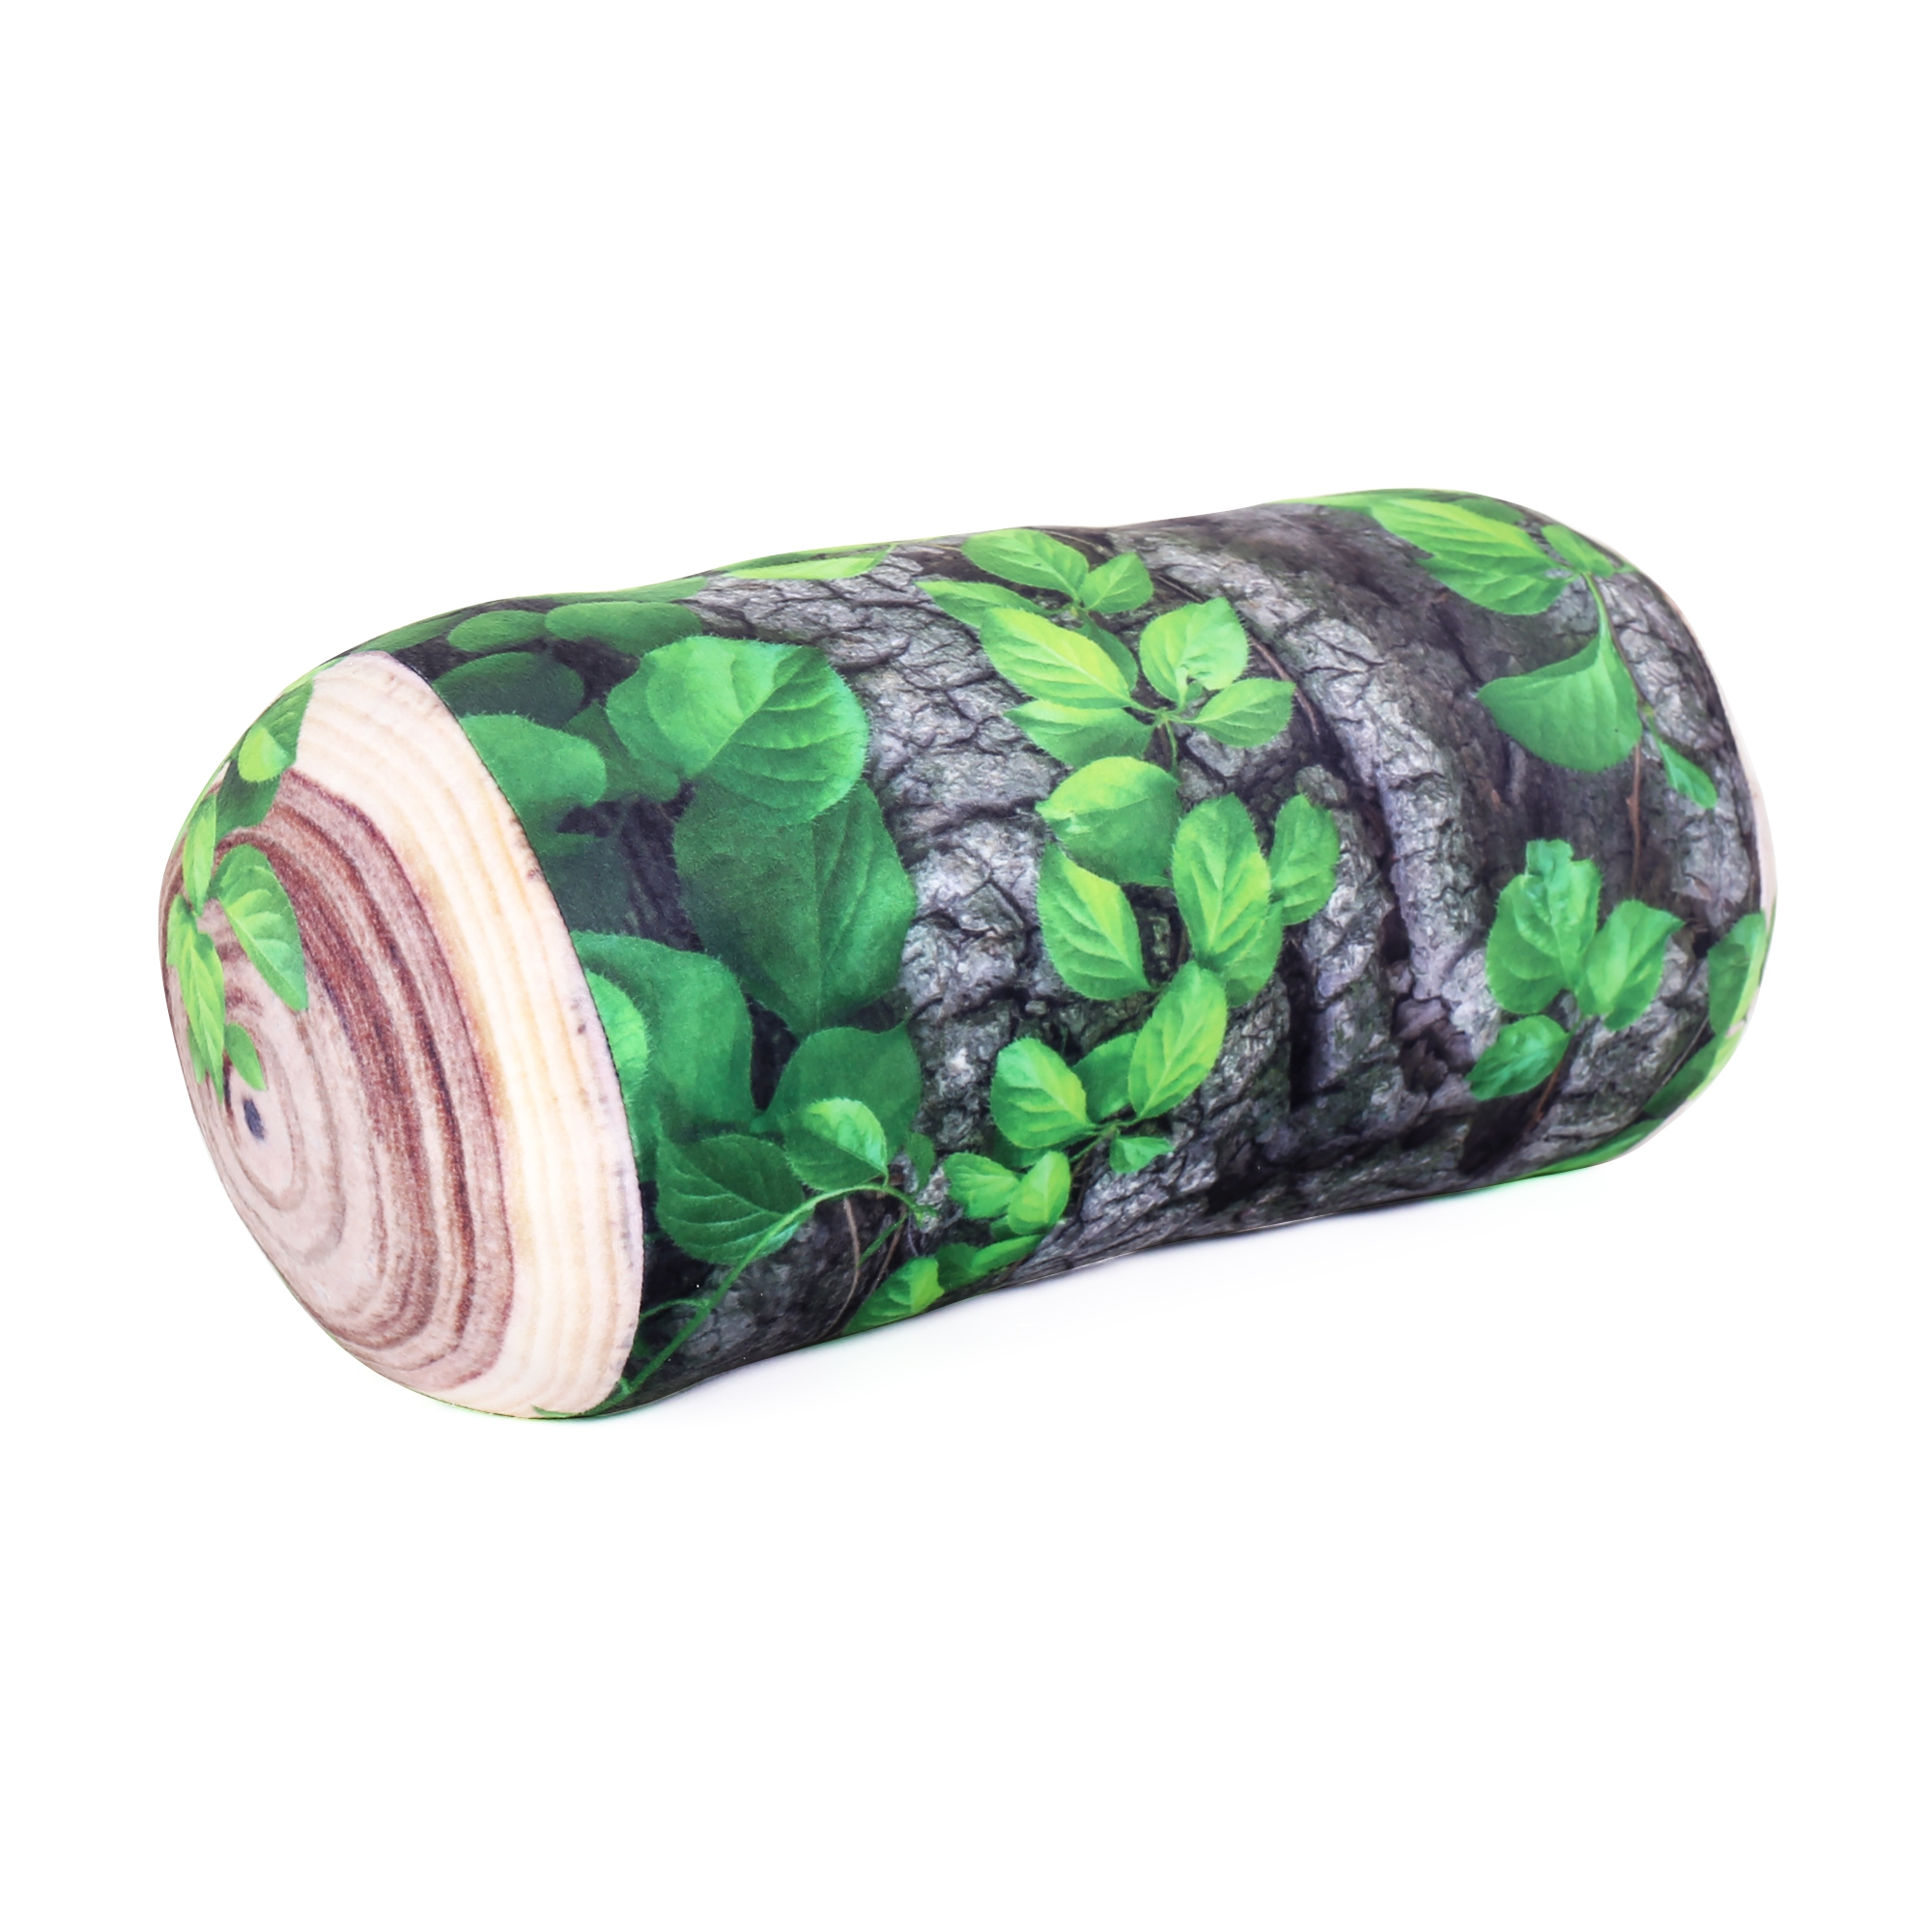 Relaxační polštáře - Relaxační polštář - Pařez